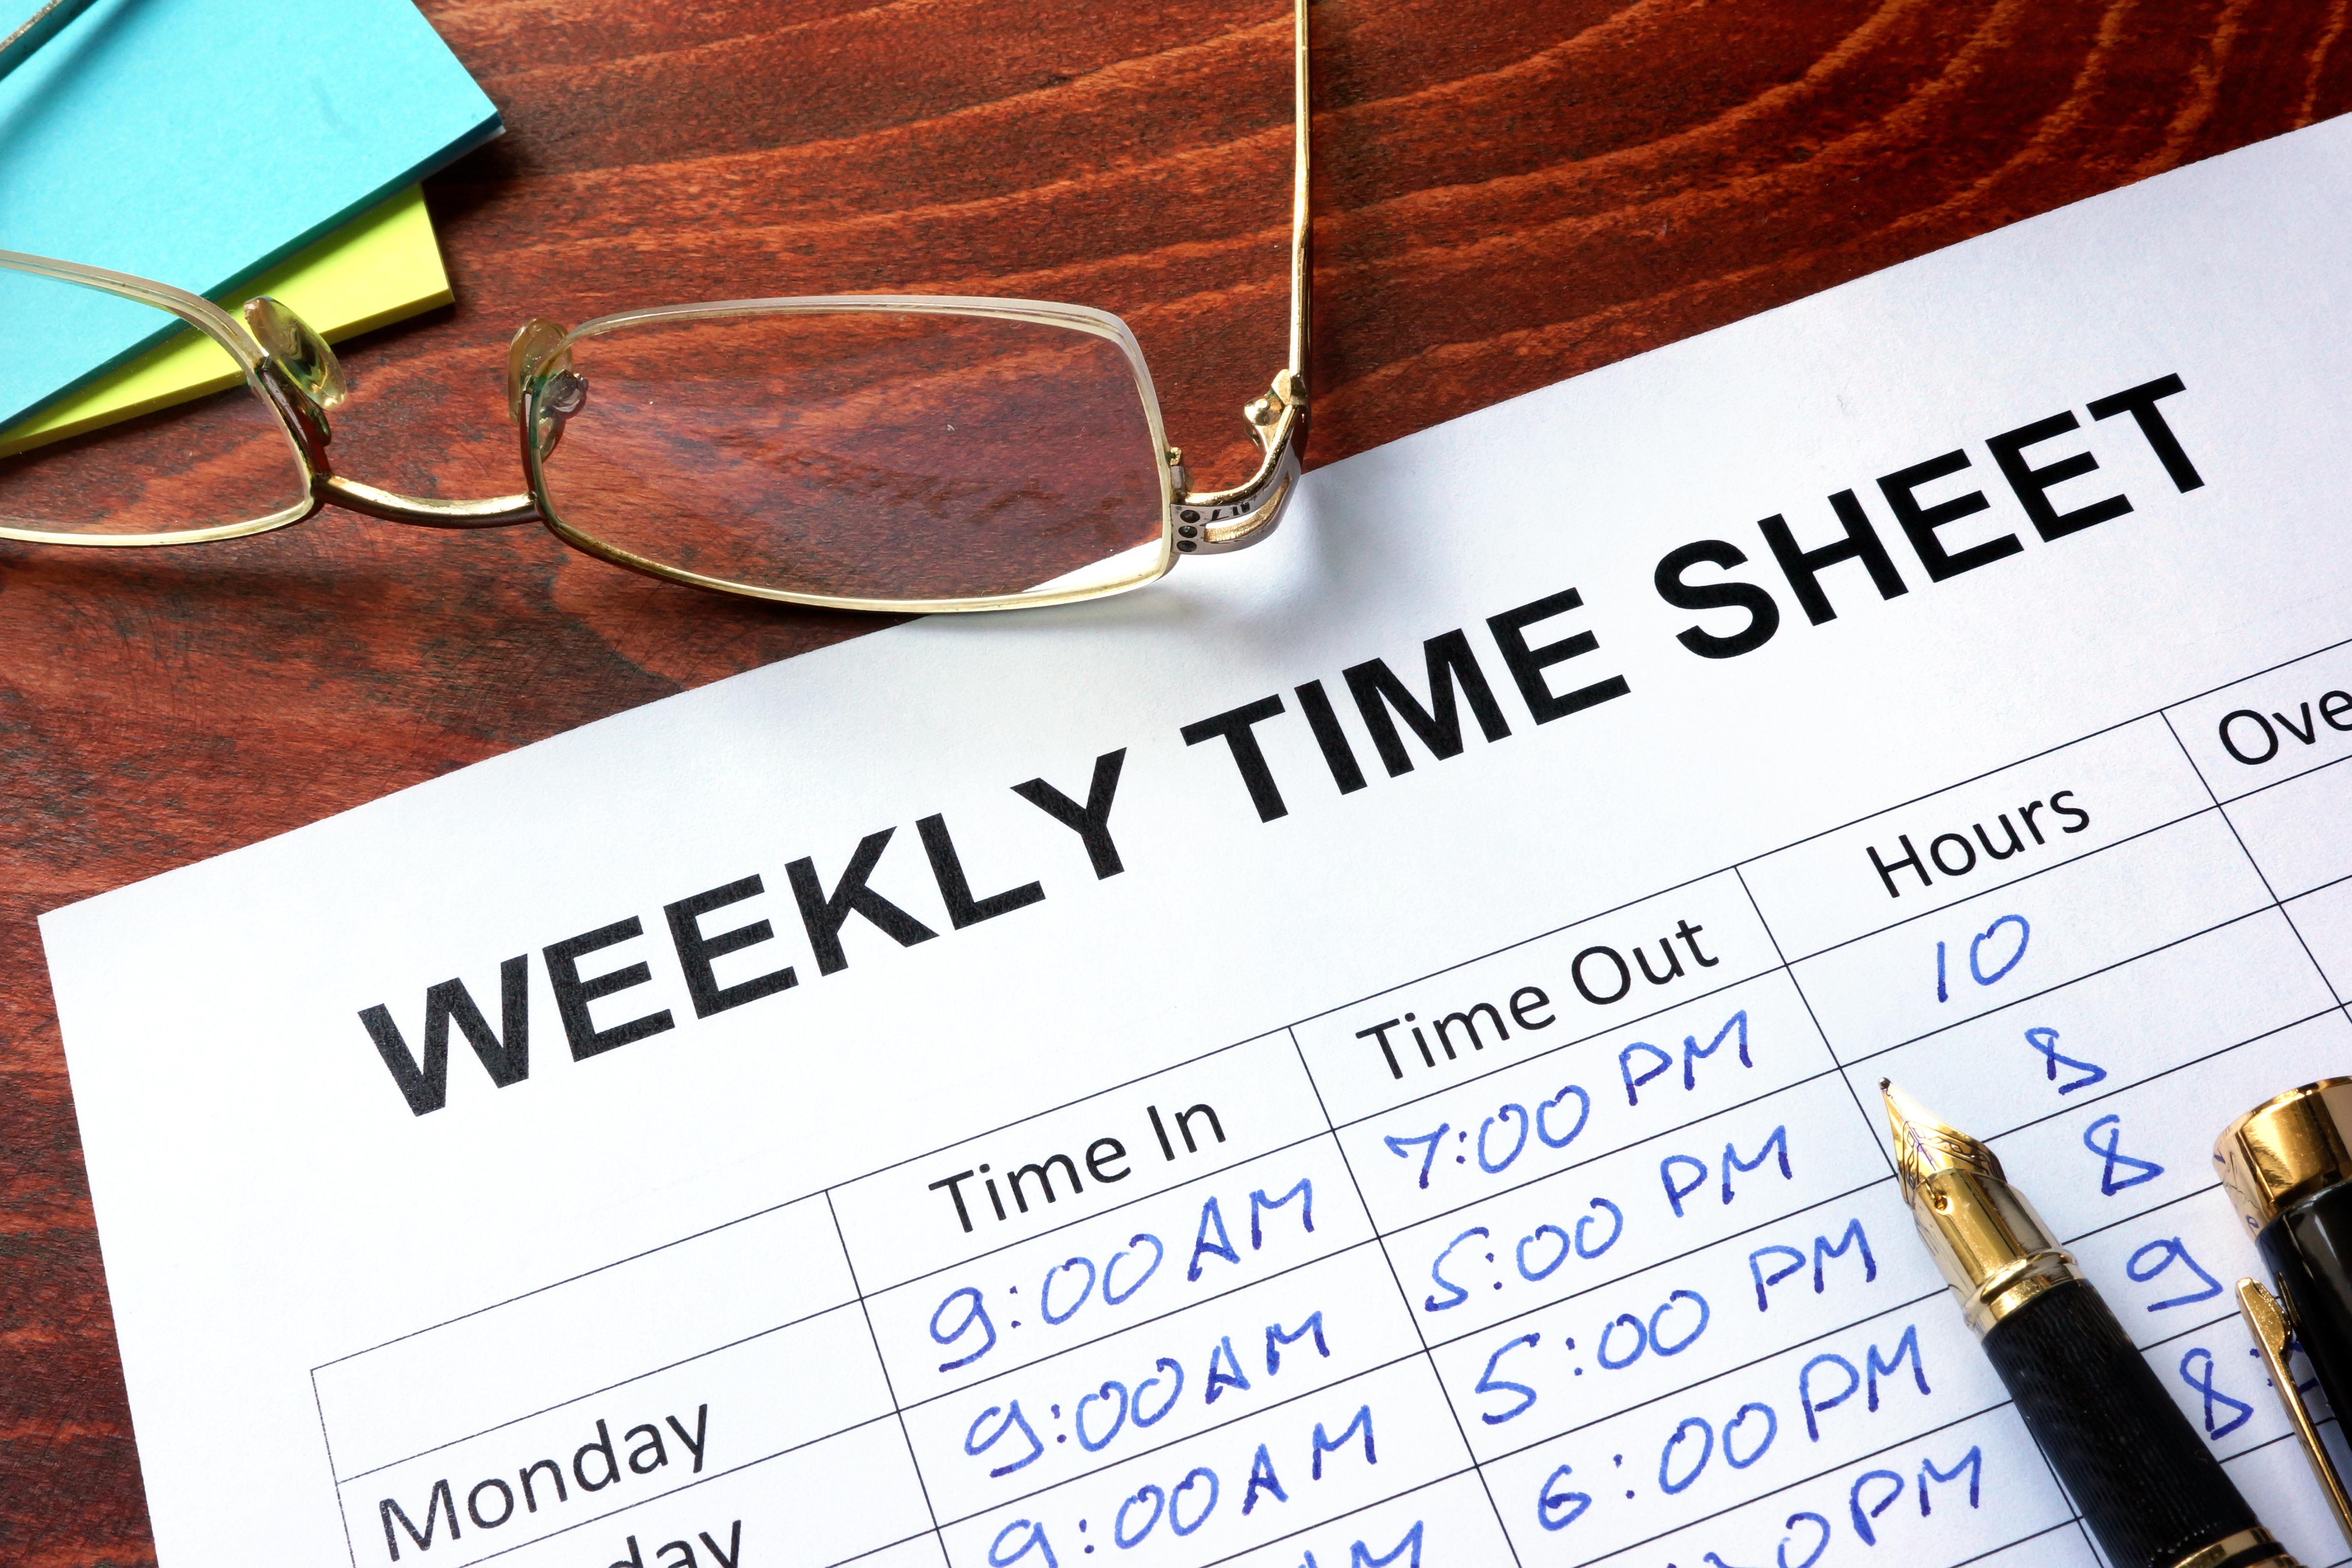 Paper timesheet